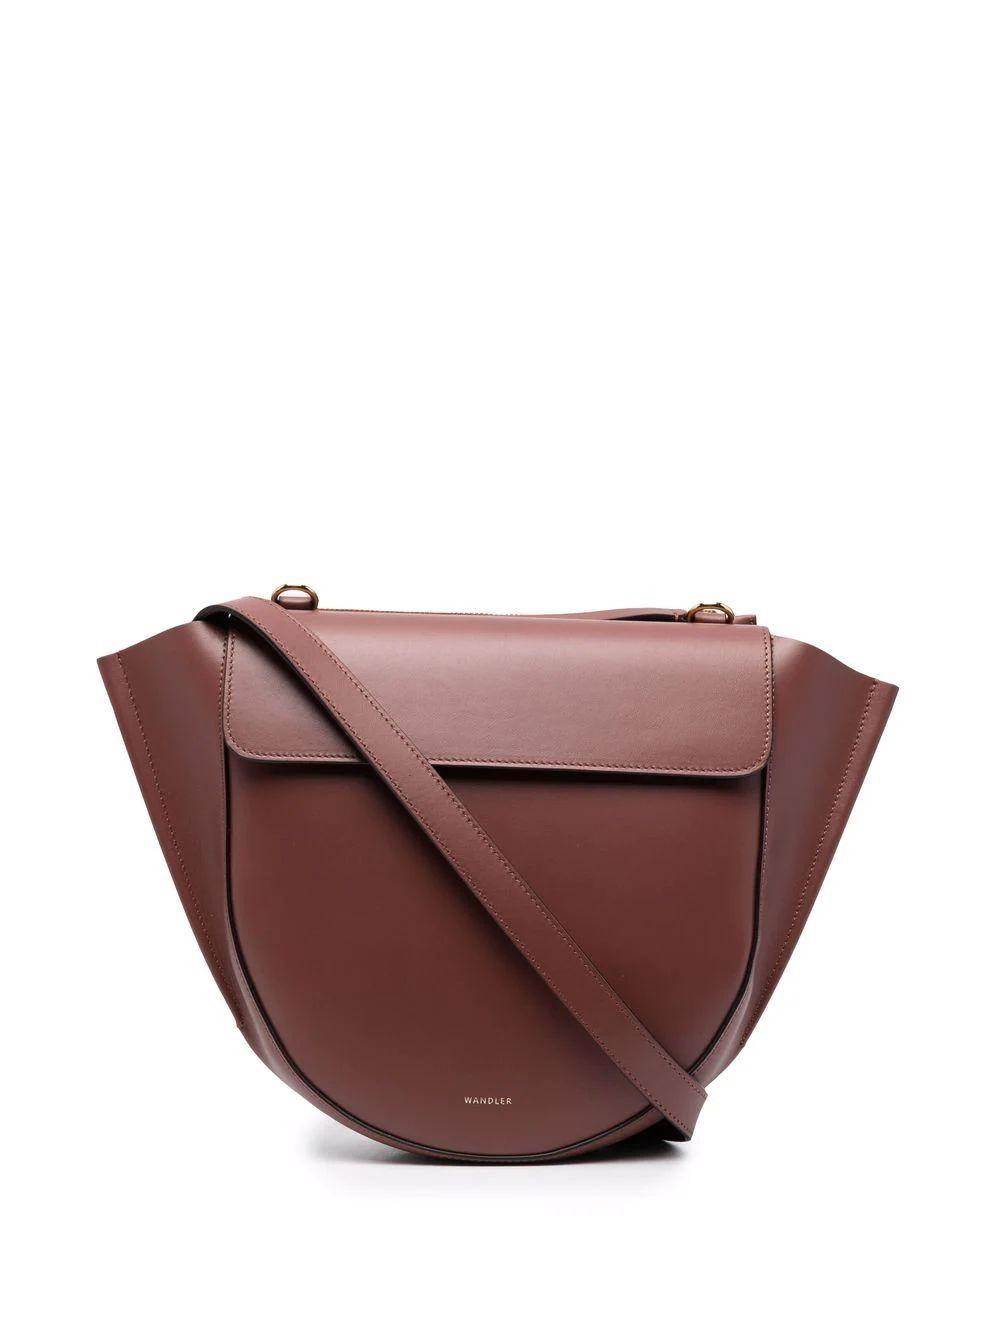 Hortensia Medium Shoulder Bag Item # 21108-21